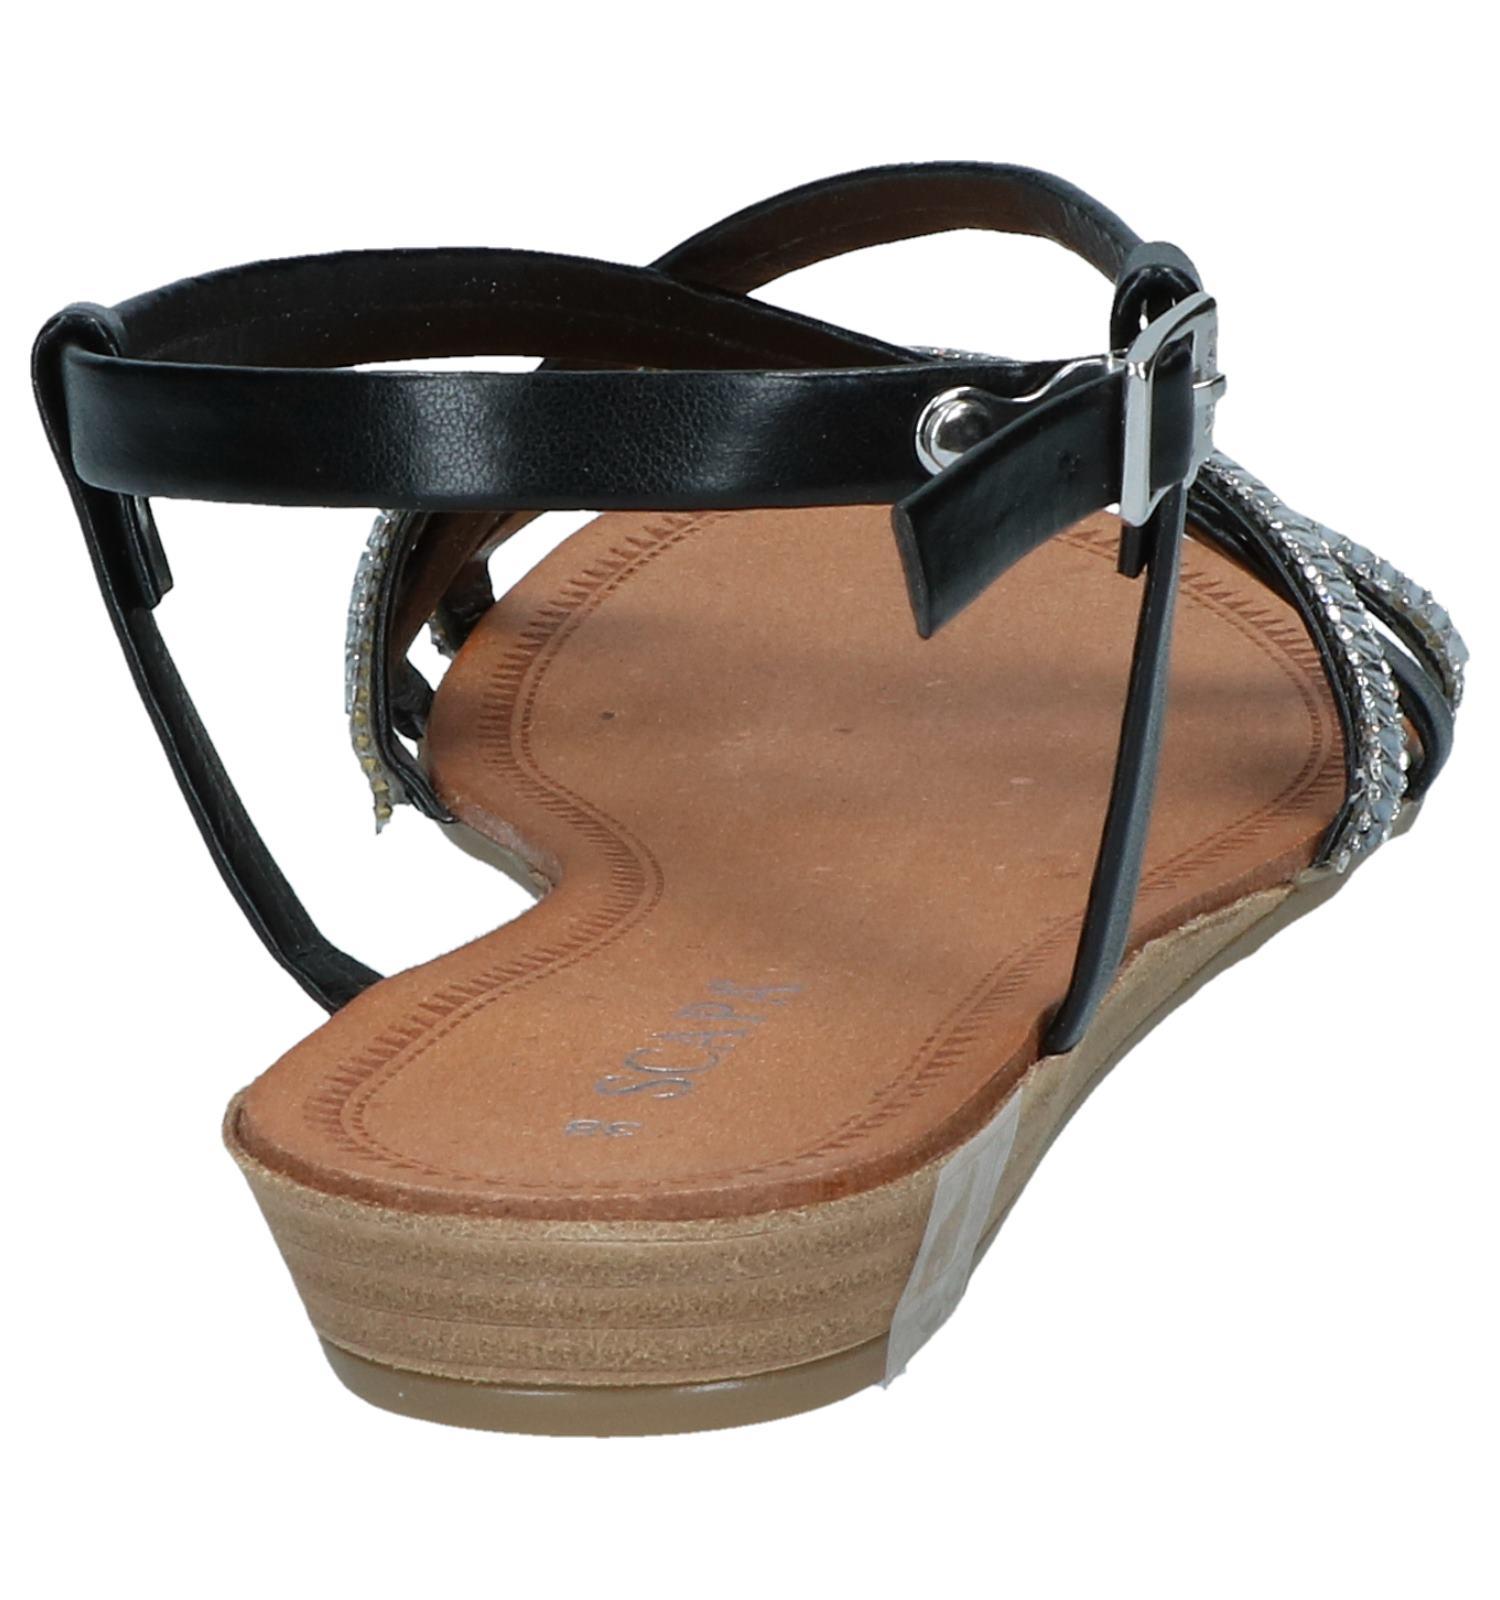 Scapa Zwarte Palomino Zwarte Palomino Sandalen Palomino Zwarte Scapa Zwarte Scapa Sandalen Sandalen WID2EH9Y